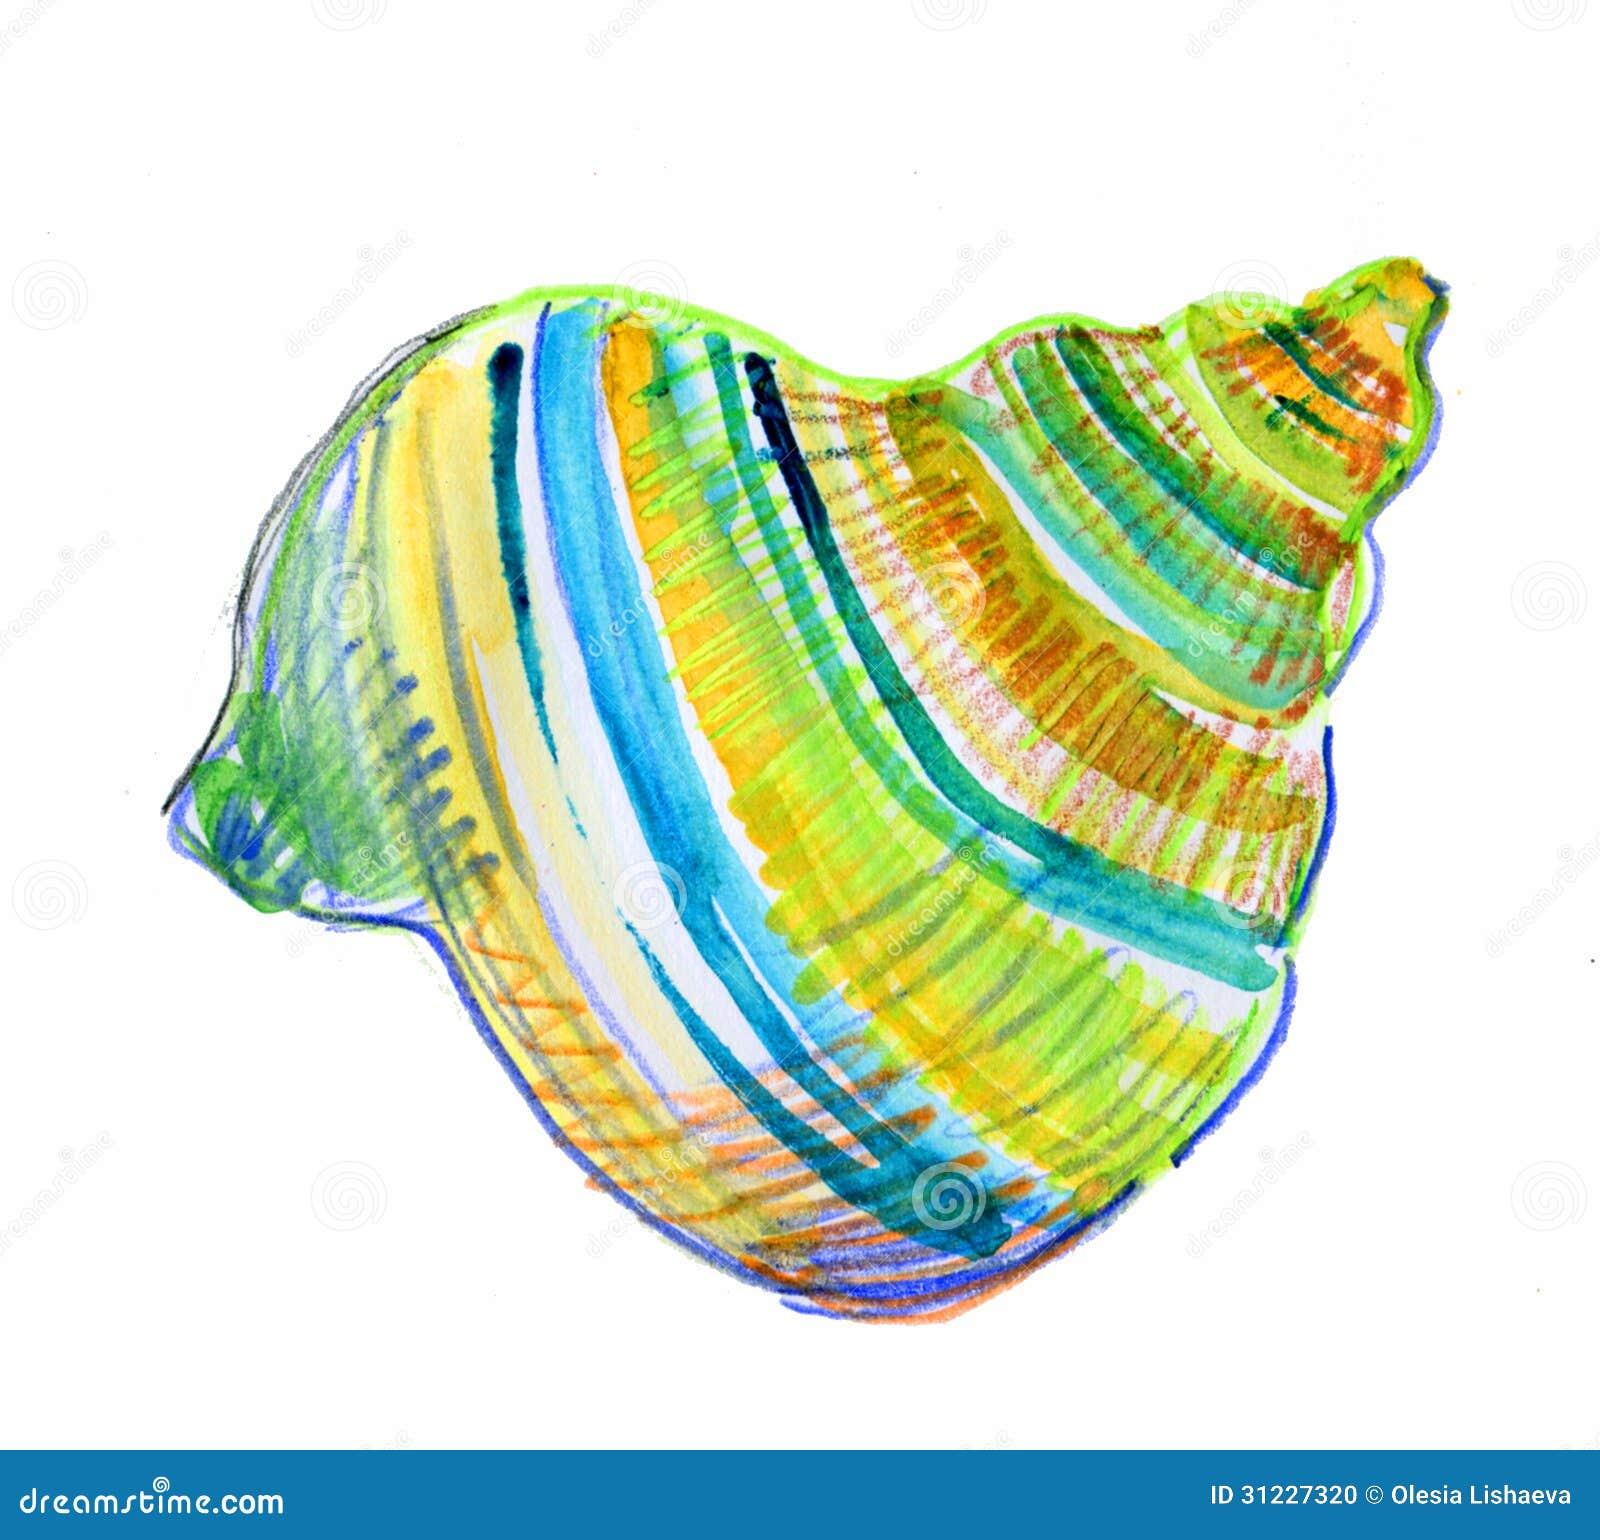 Blue Seashell Stock Photo - Image: 31227320